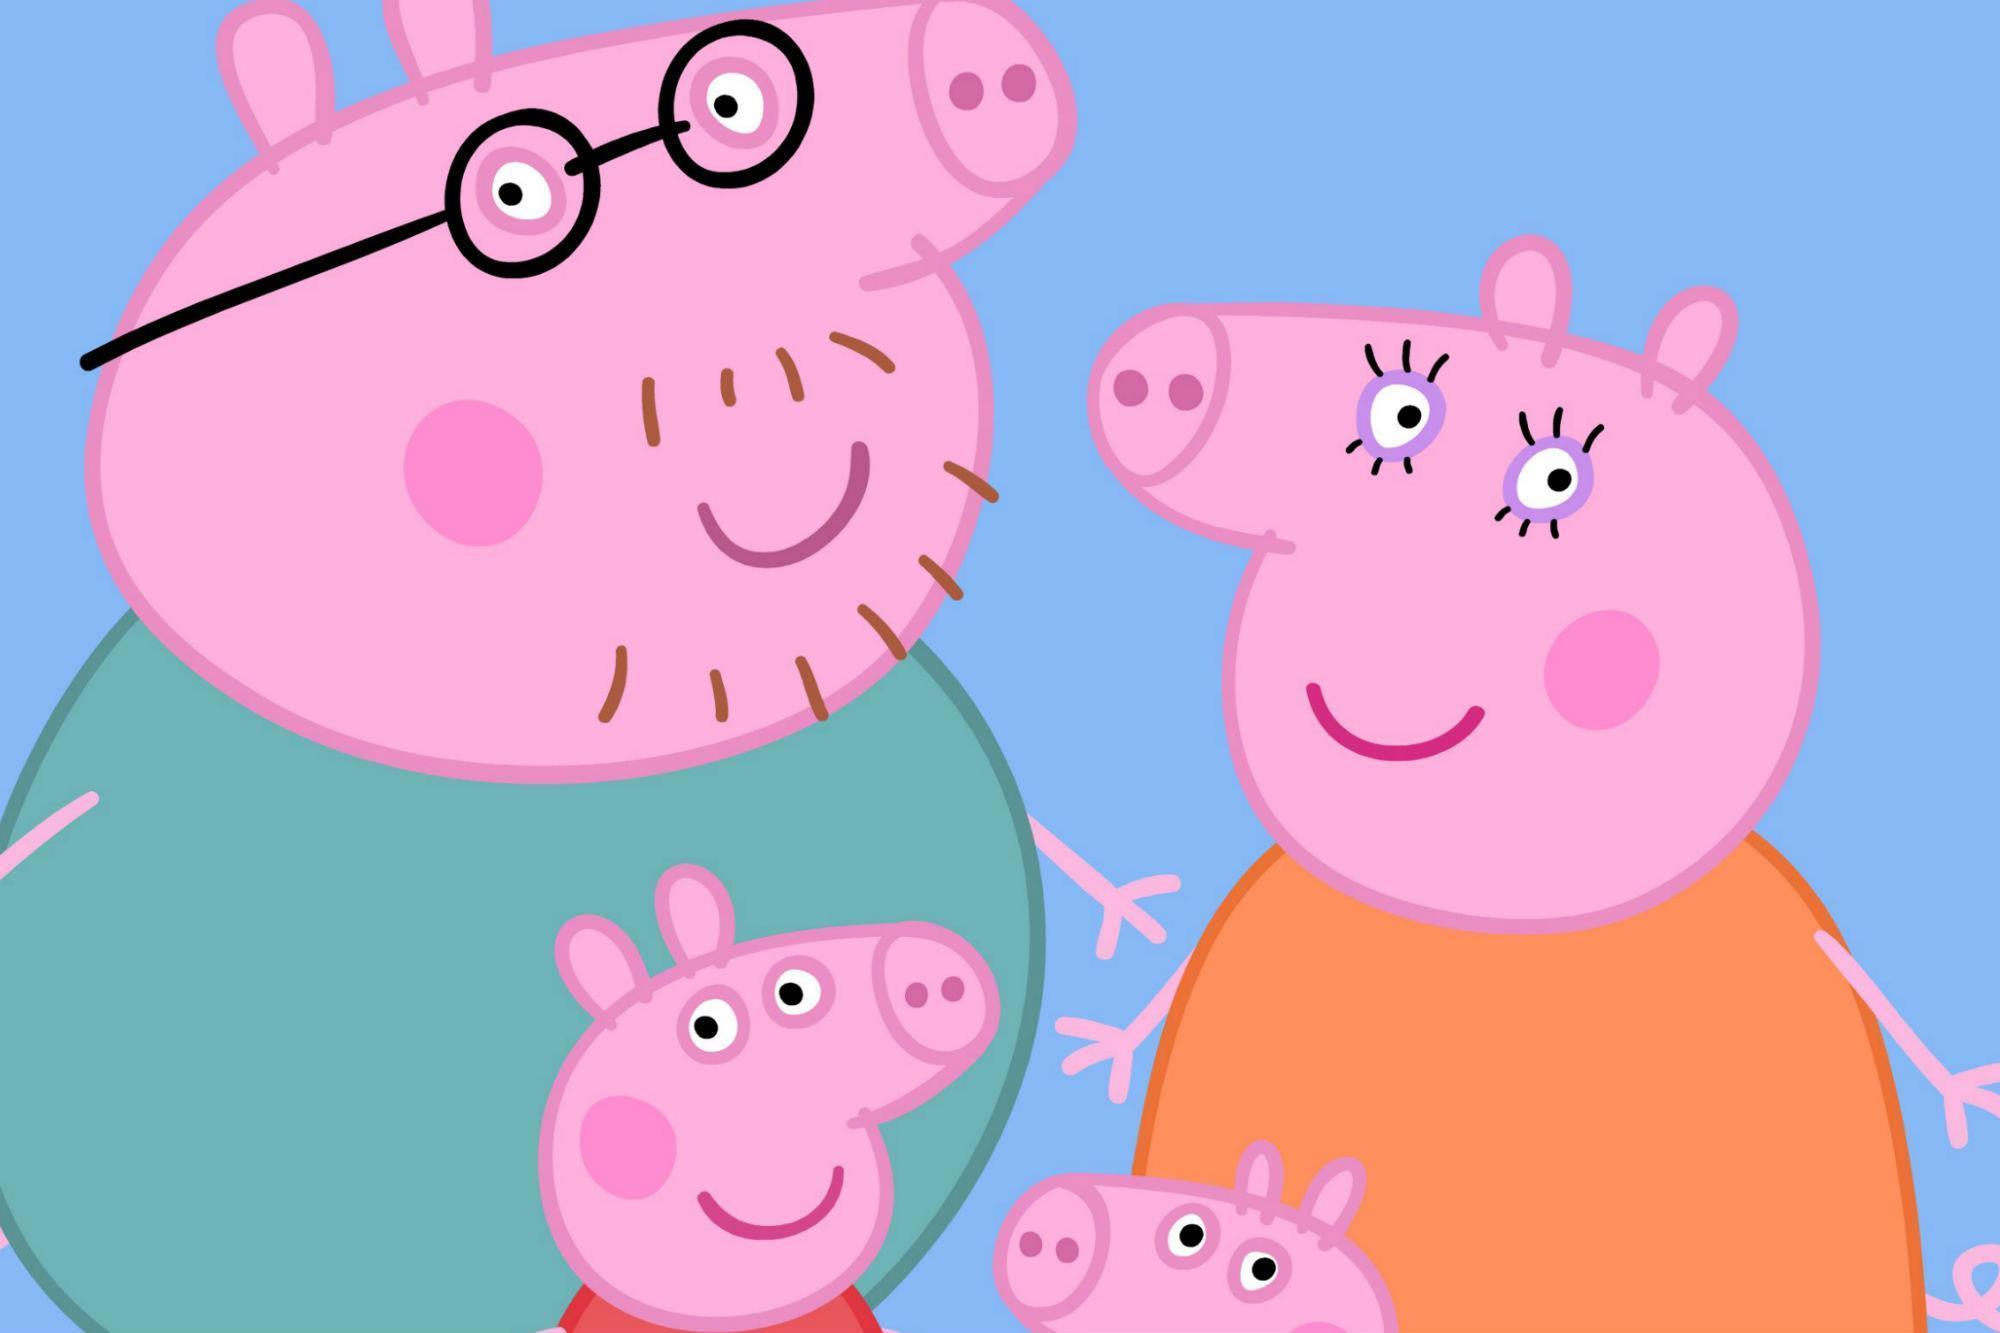 eOne, Alibaba's Peppa Pig movie sets China release date | News | Screen